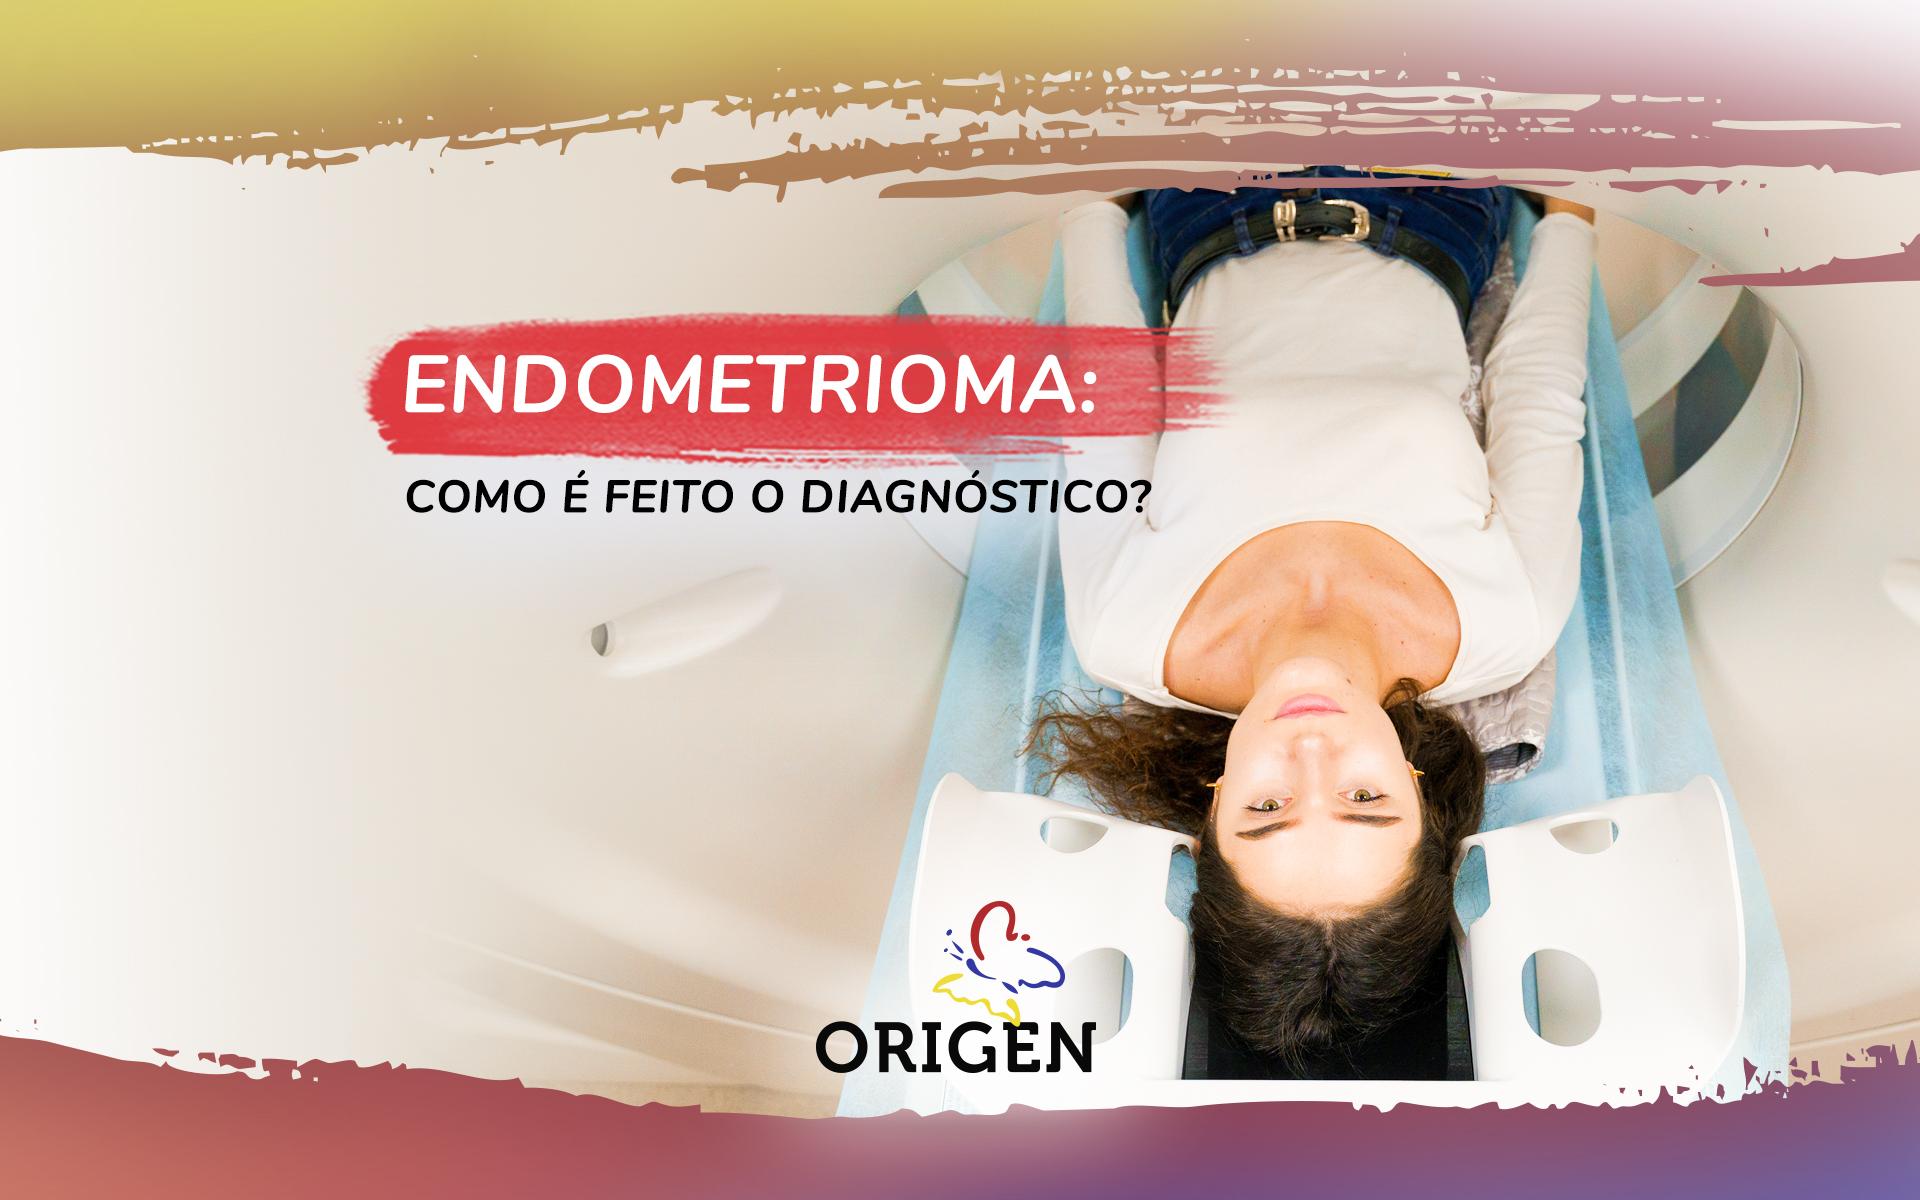 Endometrioma: como é feito o diagnóstico?